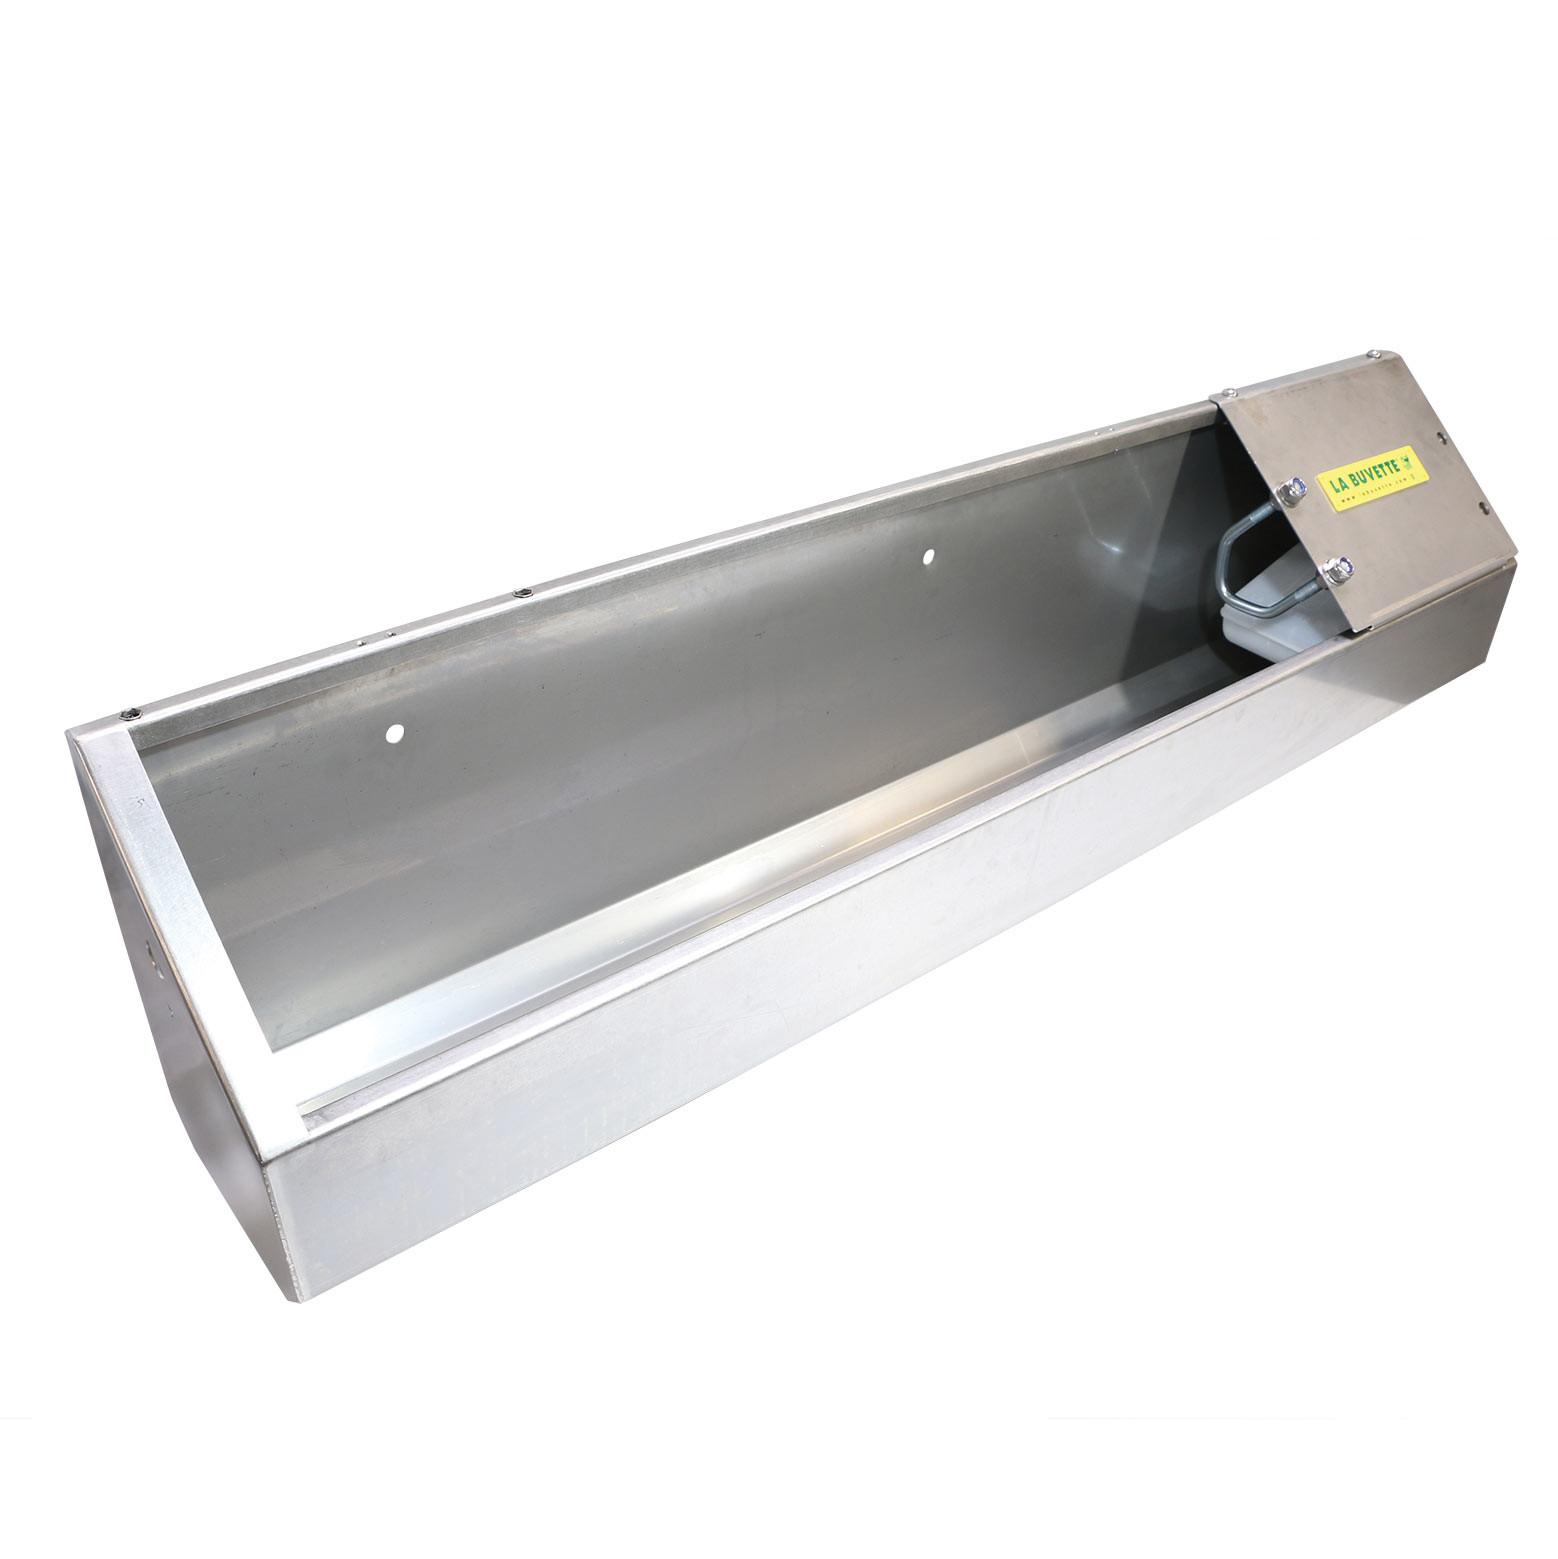 OVICAP INOX 120 abreuvoir ovin caprin